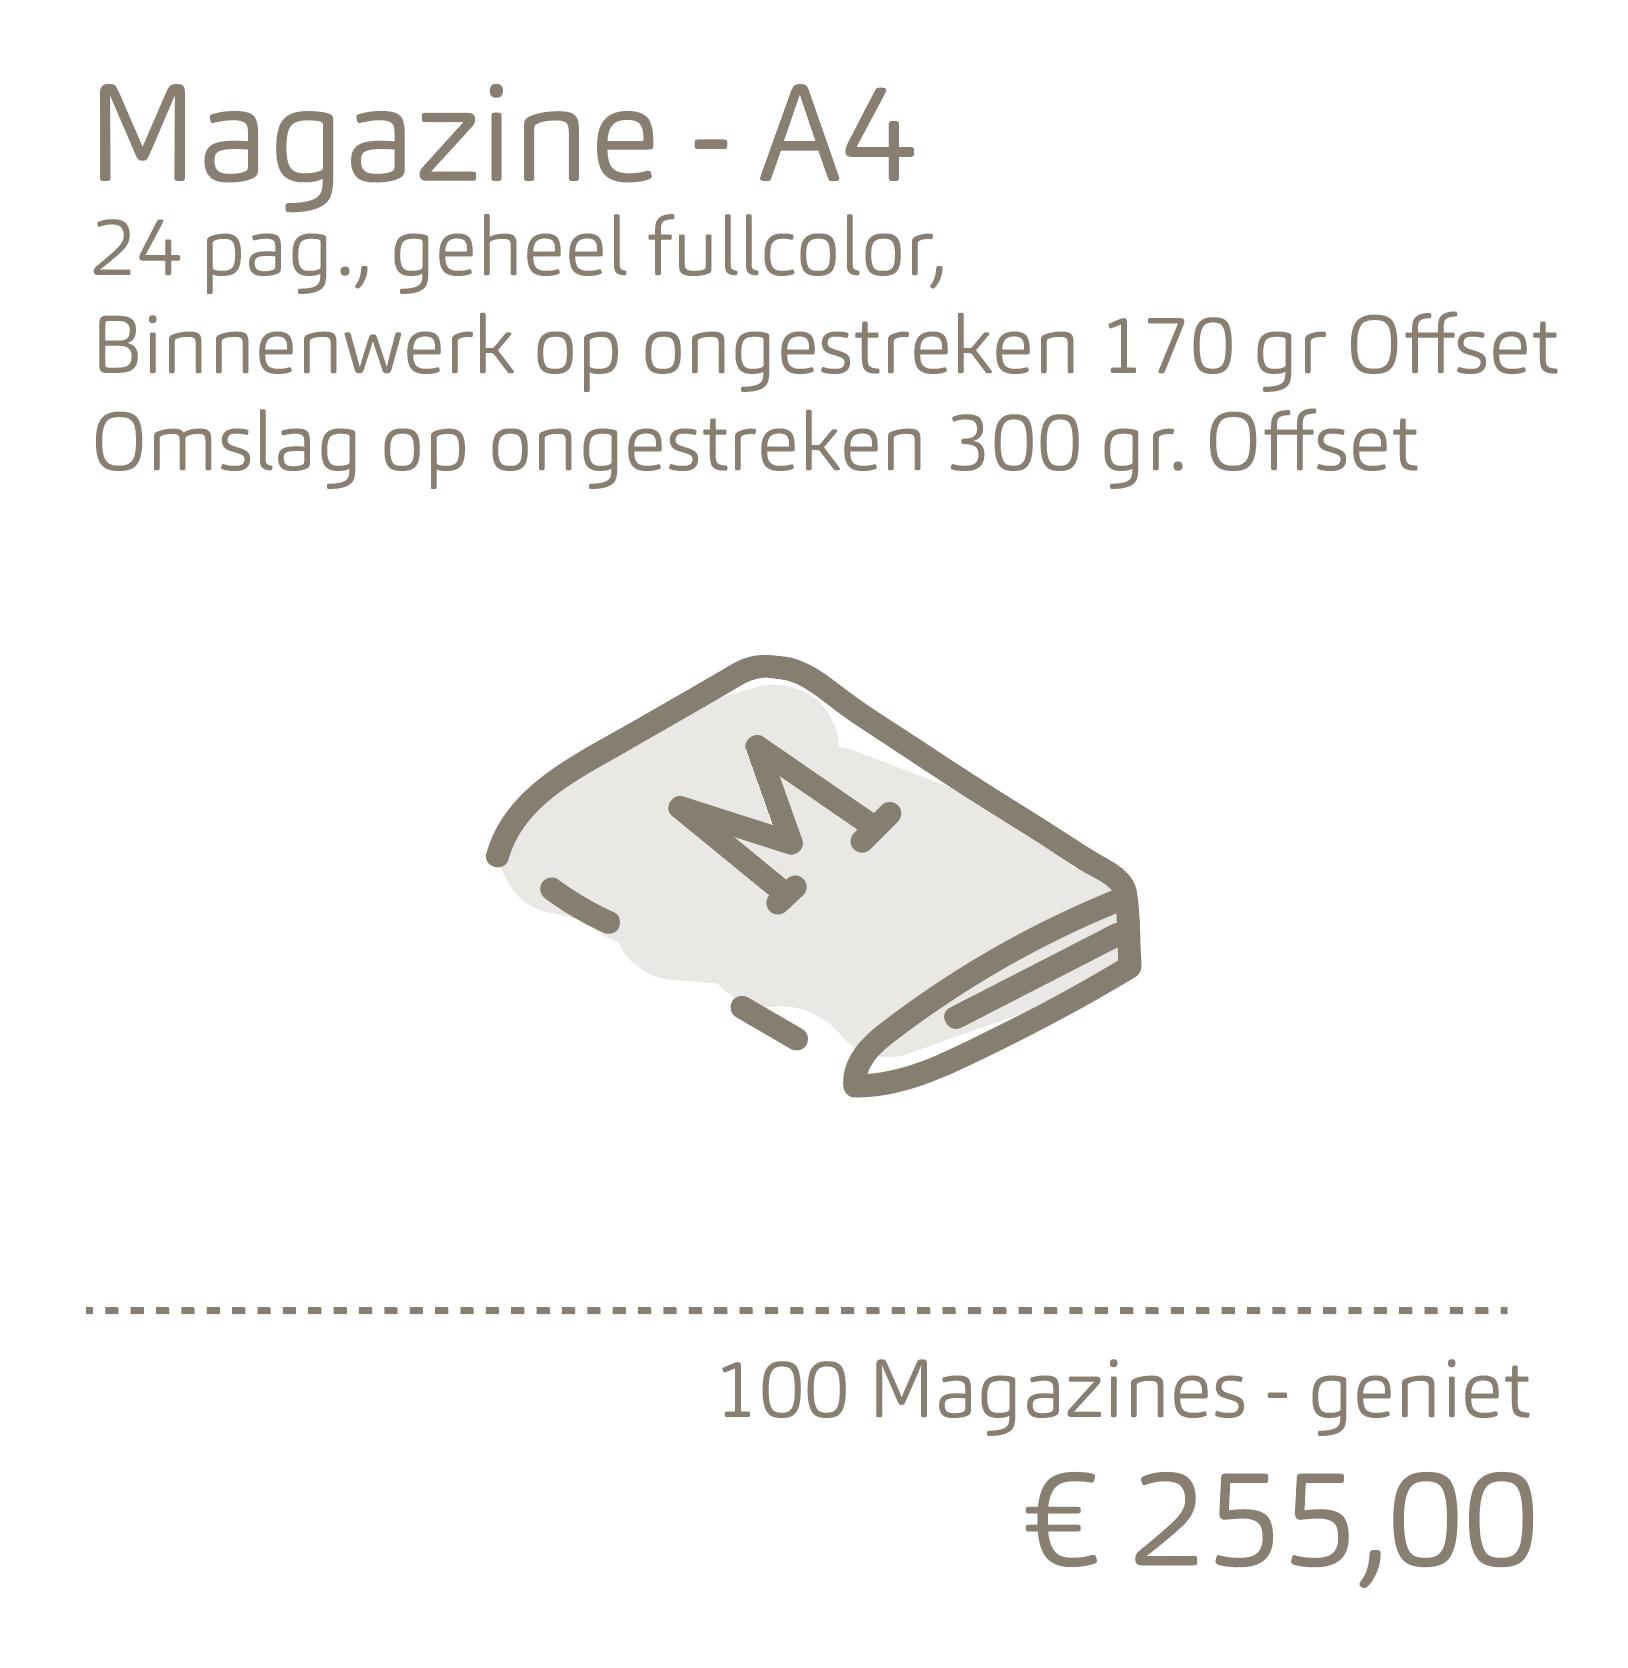 Magazine-A4 op ongestreken papier